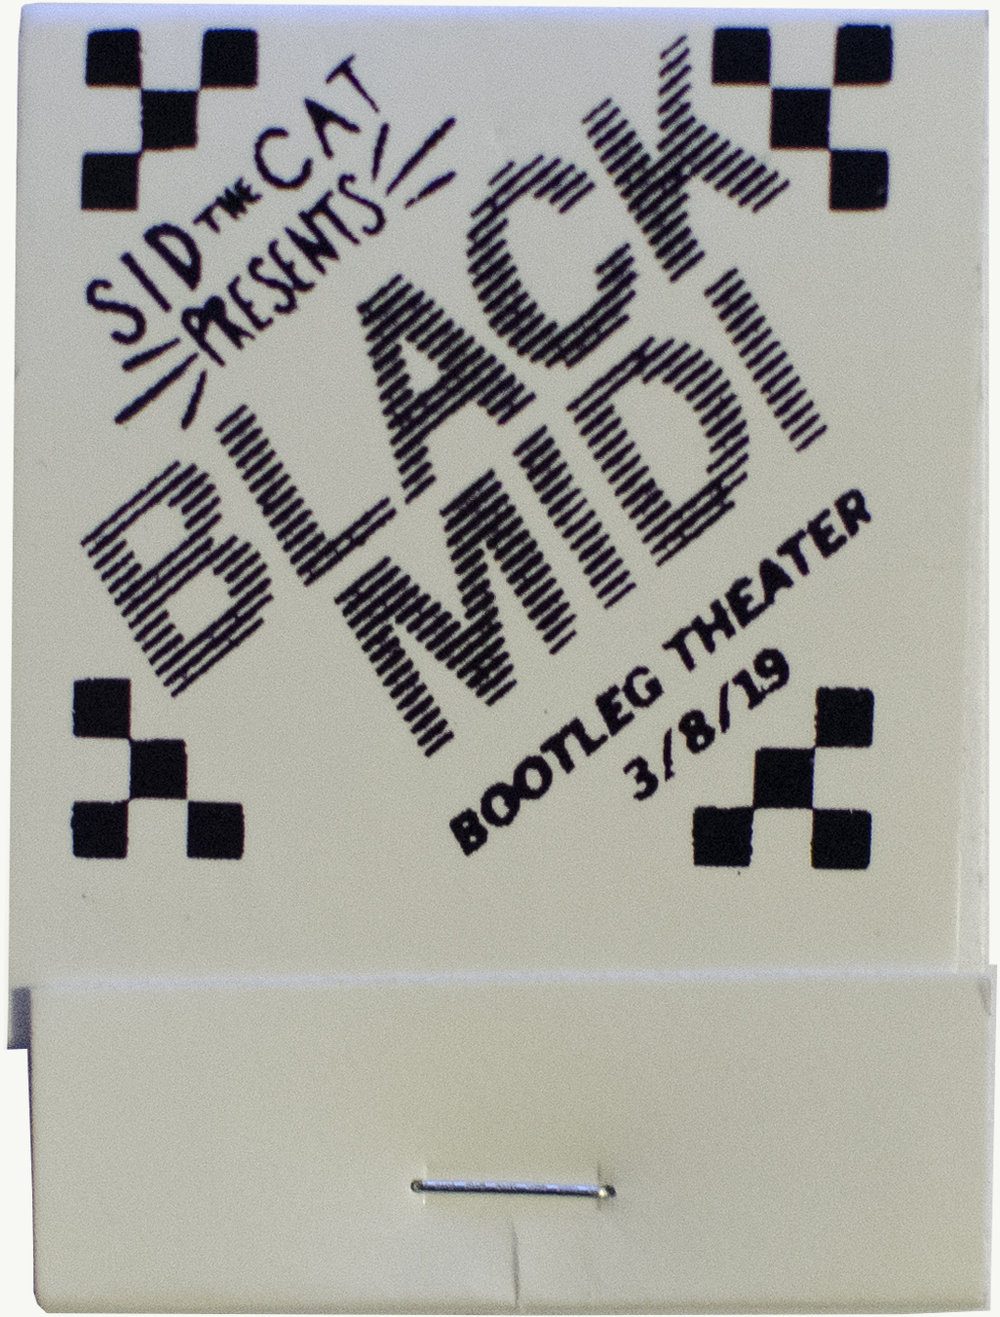 2019.3.8 Black Midi.jpg